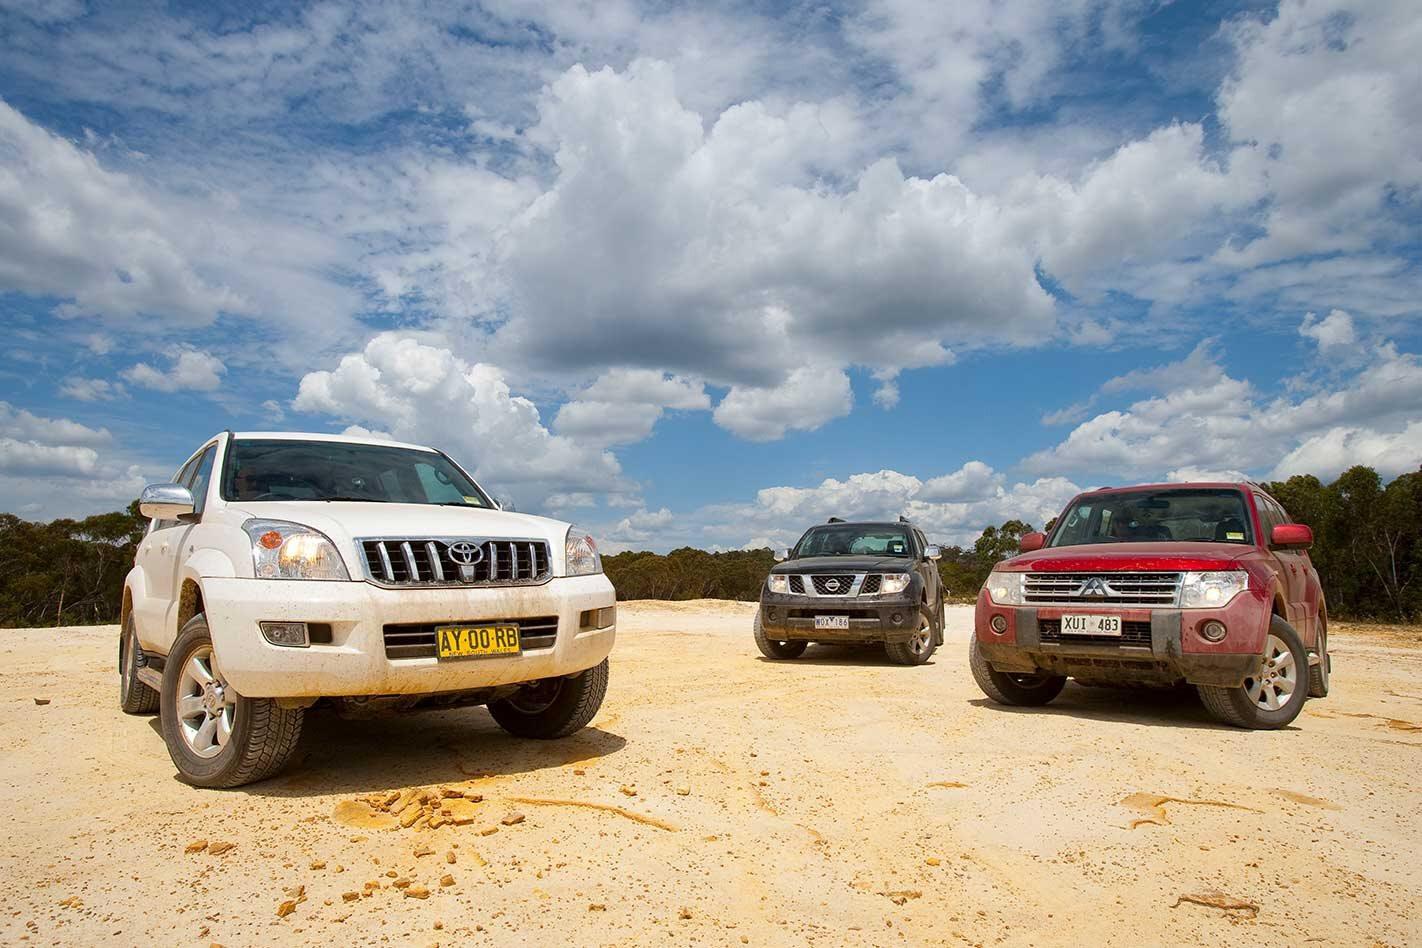 2009 Toyota Prado vs Nissan Pathfinder vs Mitsubishi Pajero comparison